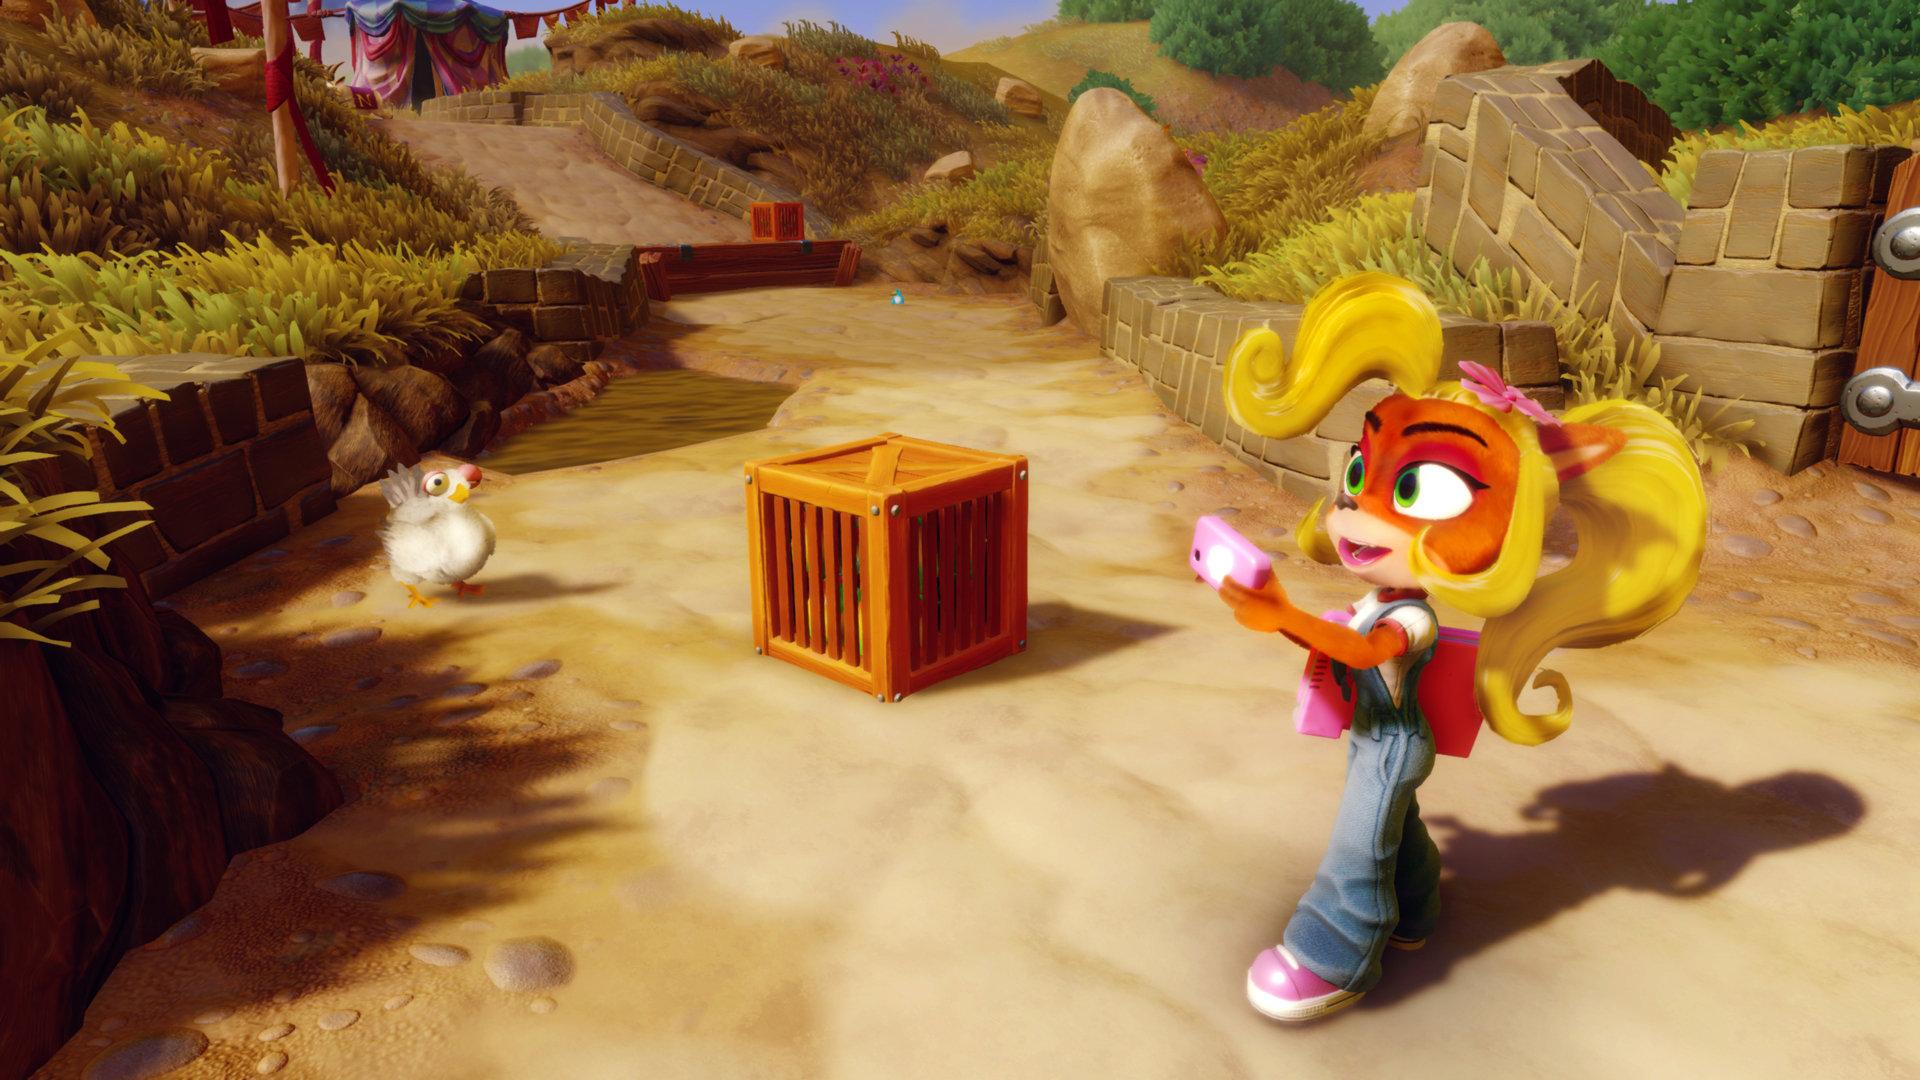 crash-bandicoot-n-sane-trilogy-screen-18-ps4-eu-20jun17.jpg